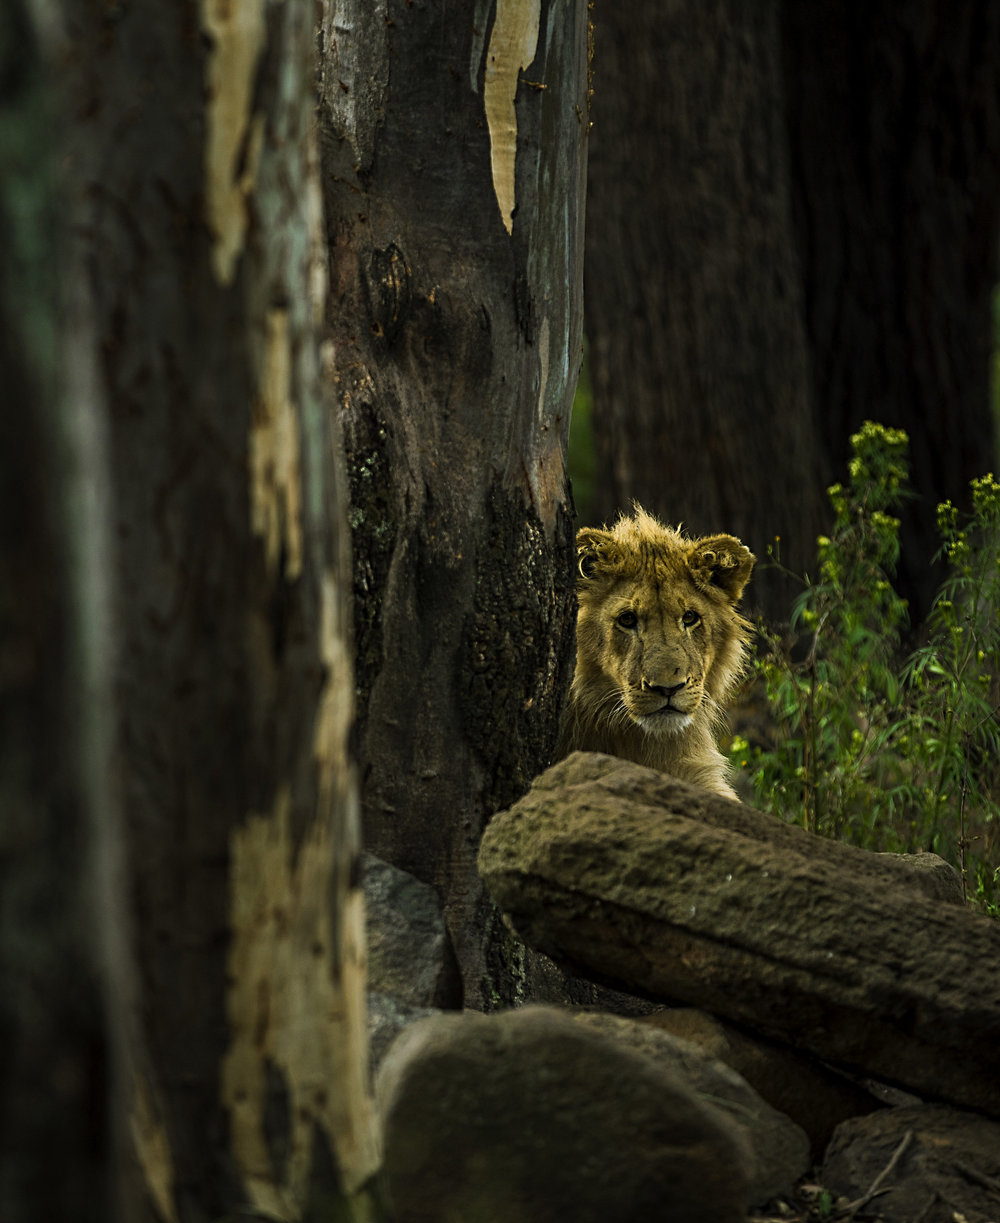 Simon+Needham+Humanitarian+Photography+Lions+of+Africa+15.jpg